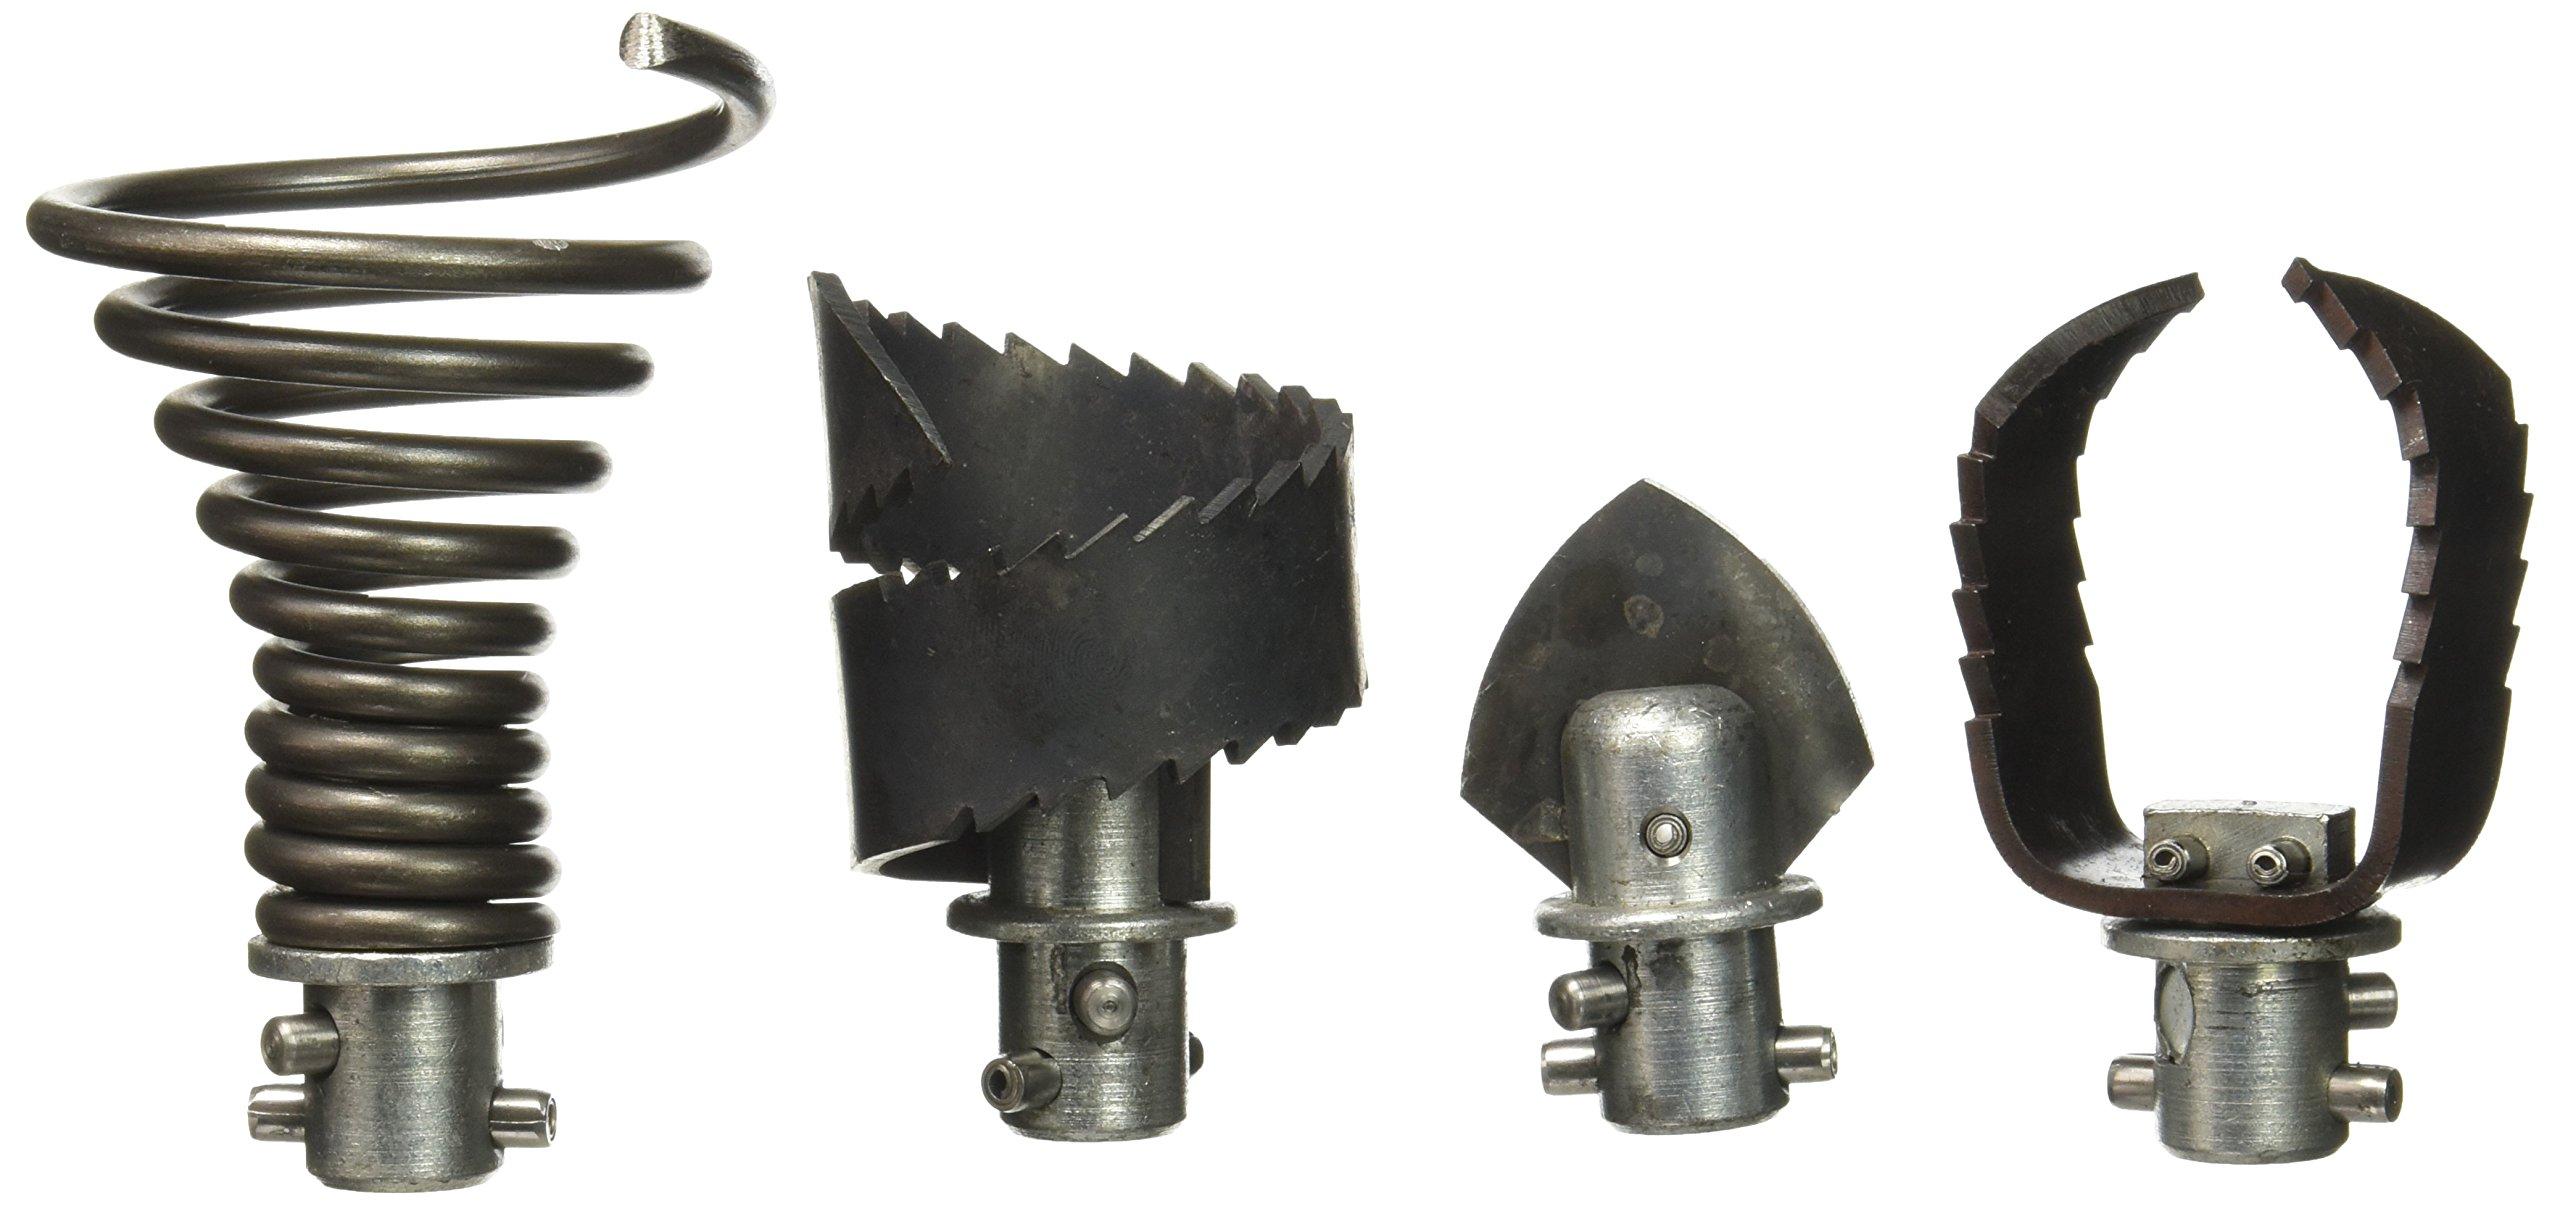 Electric Eel R-TS 4PC Model R Tool Set